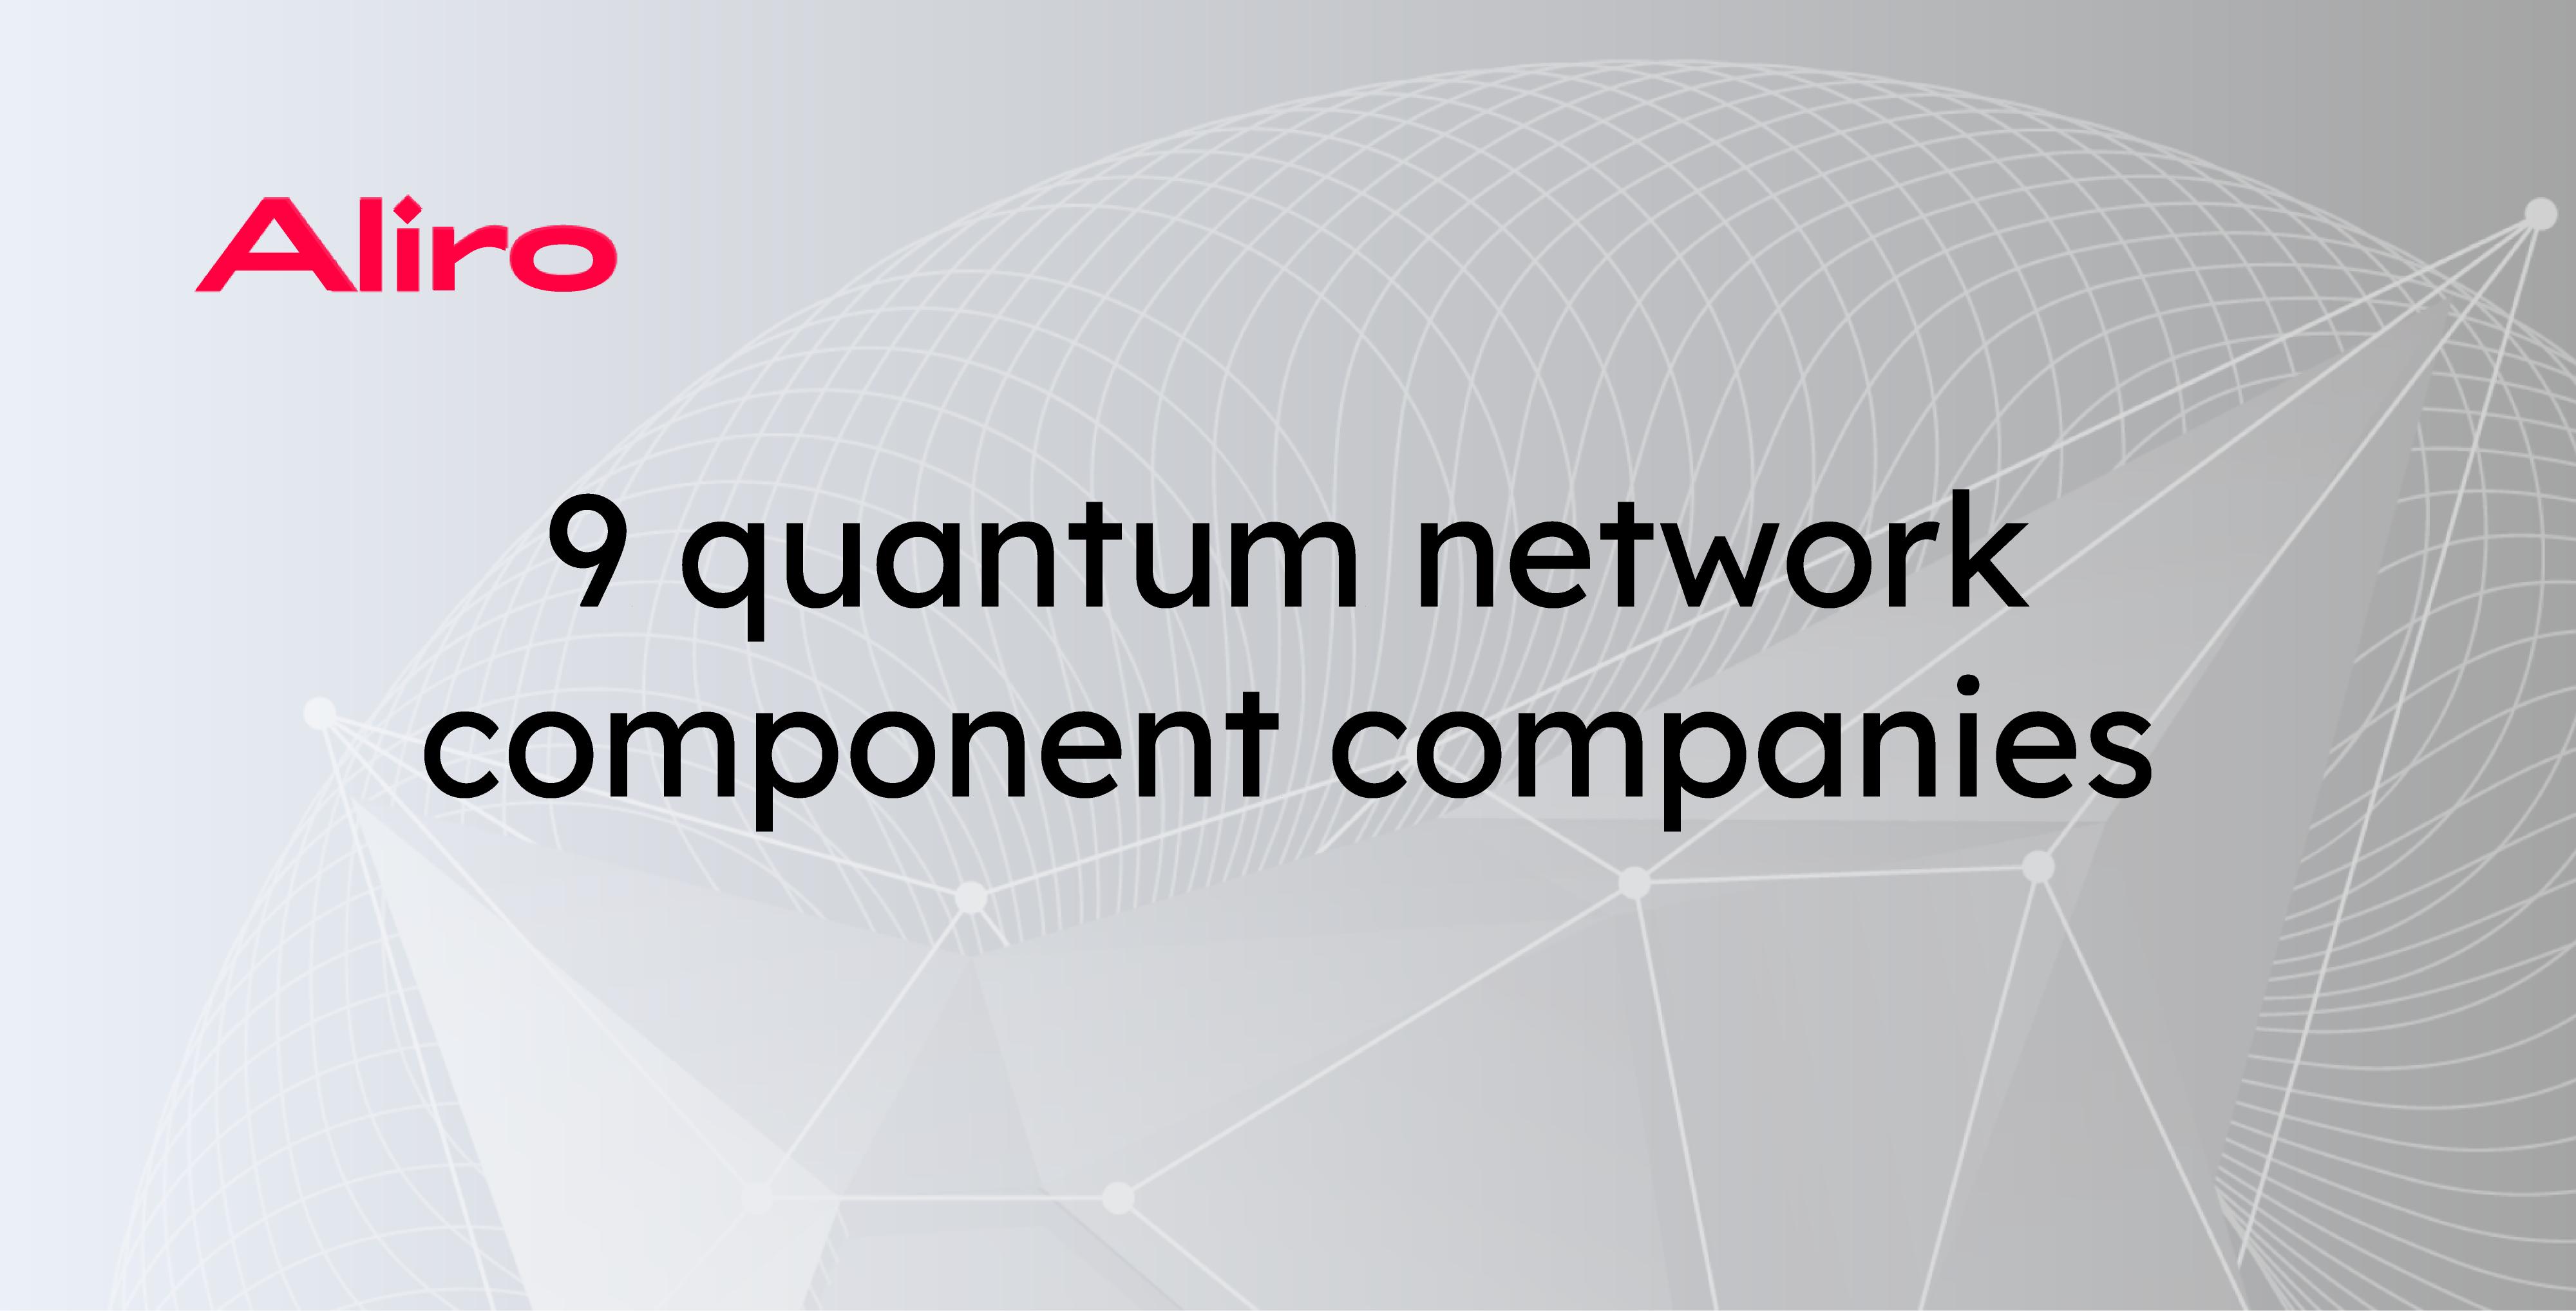 9 quantum network component companies [list]